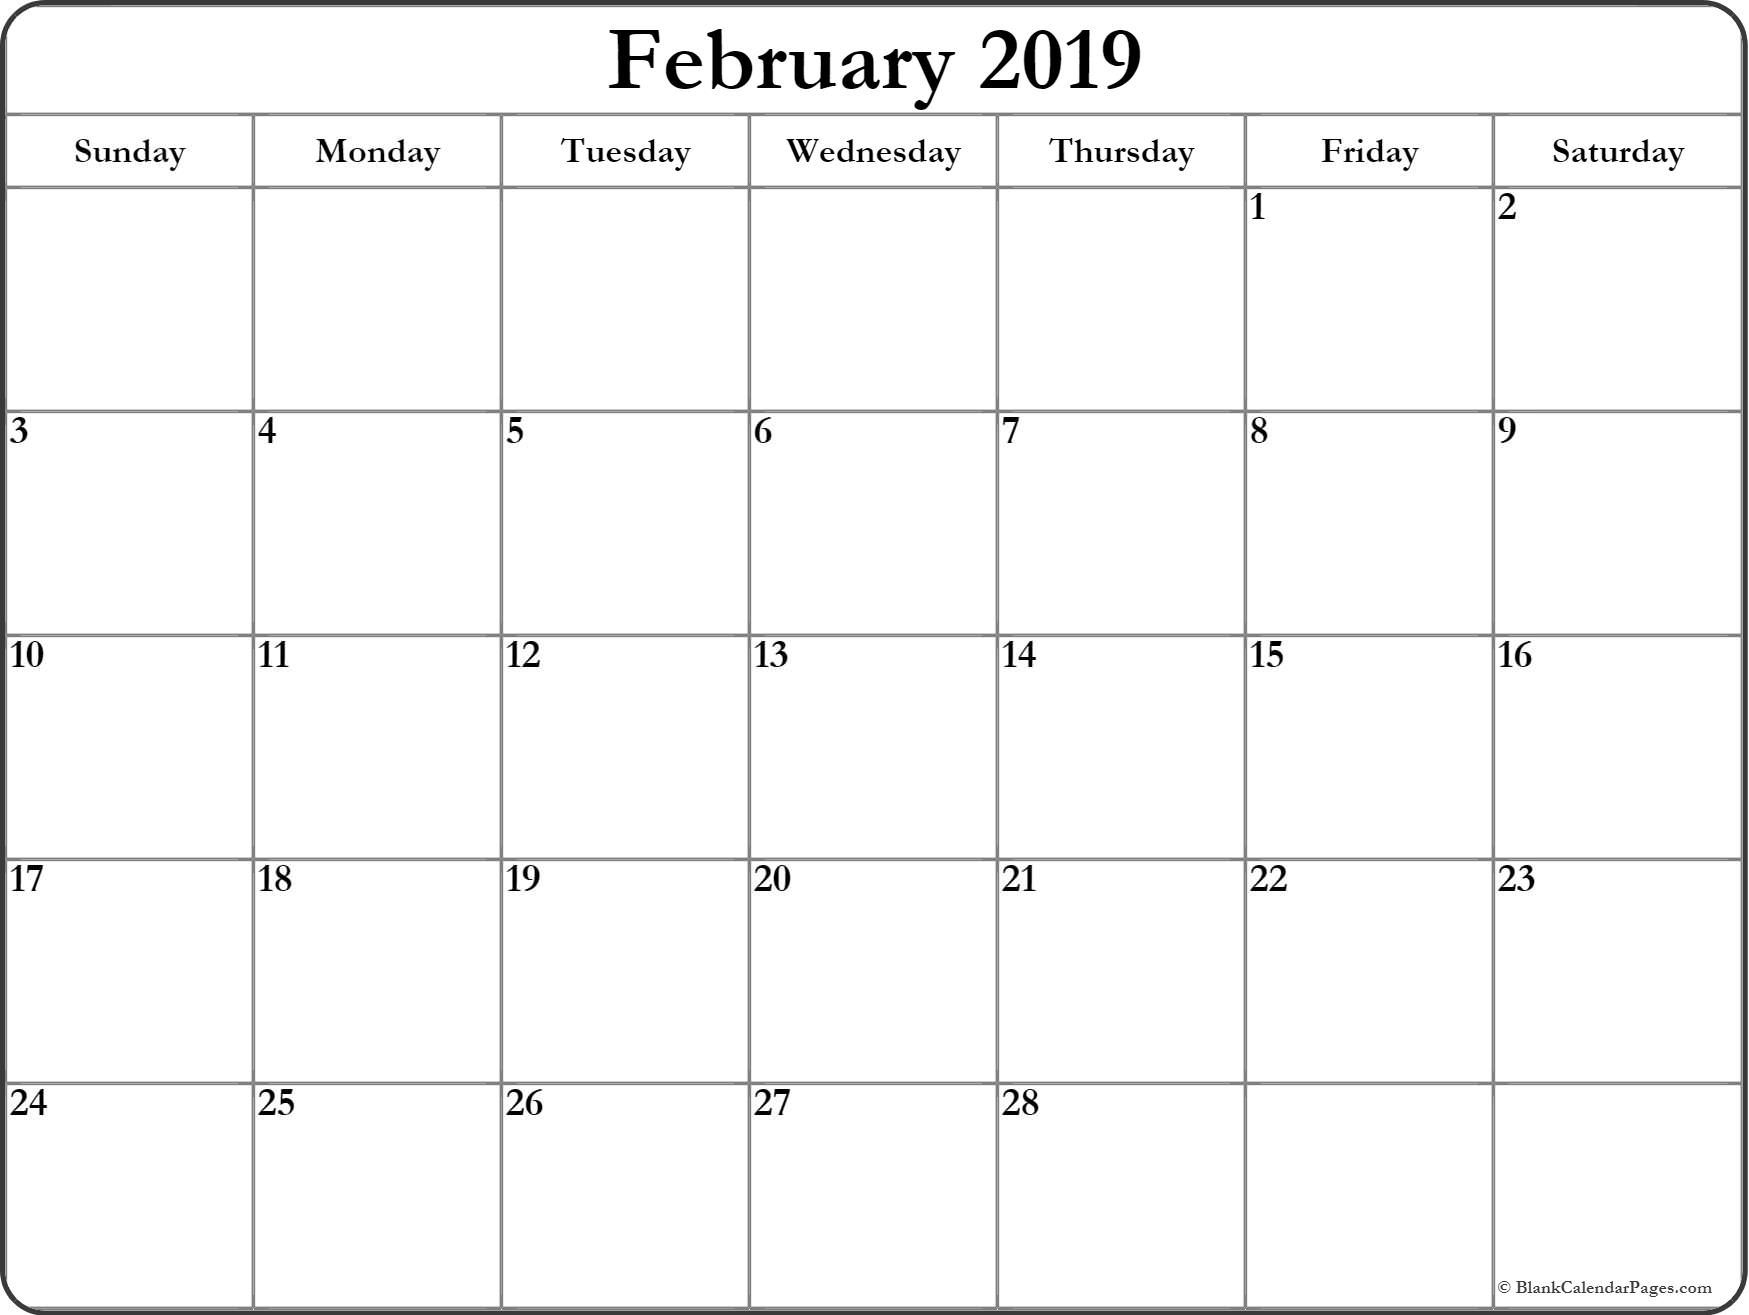 Free Printable February 2019 Calendar Template February